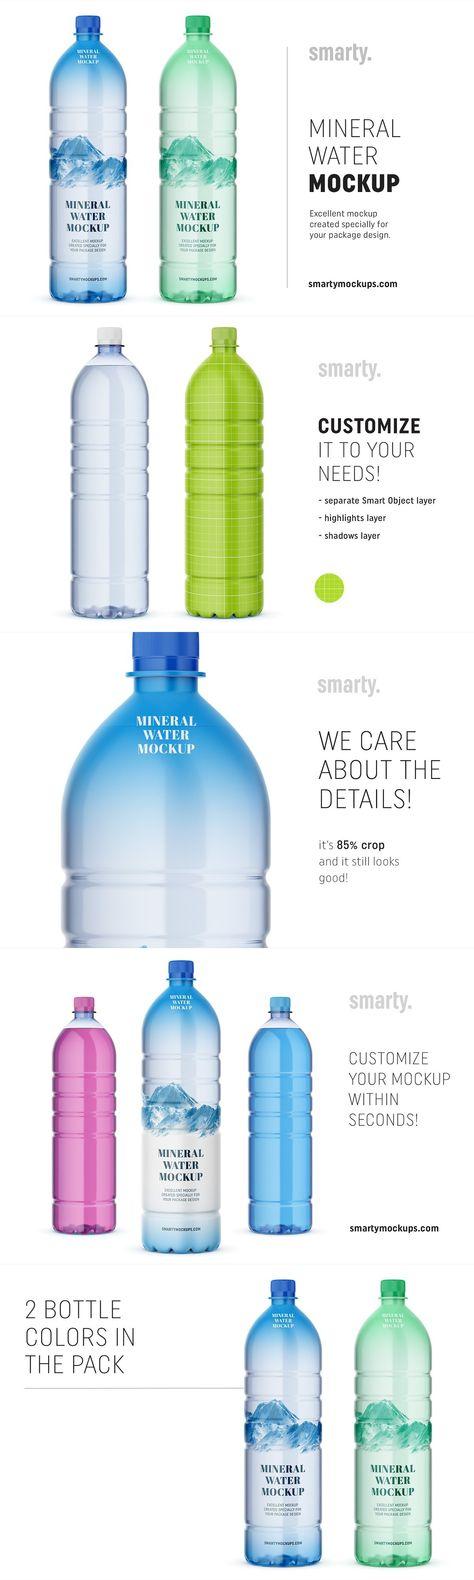 Mineral water bottle mockup